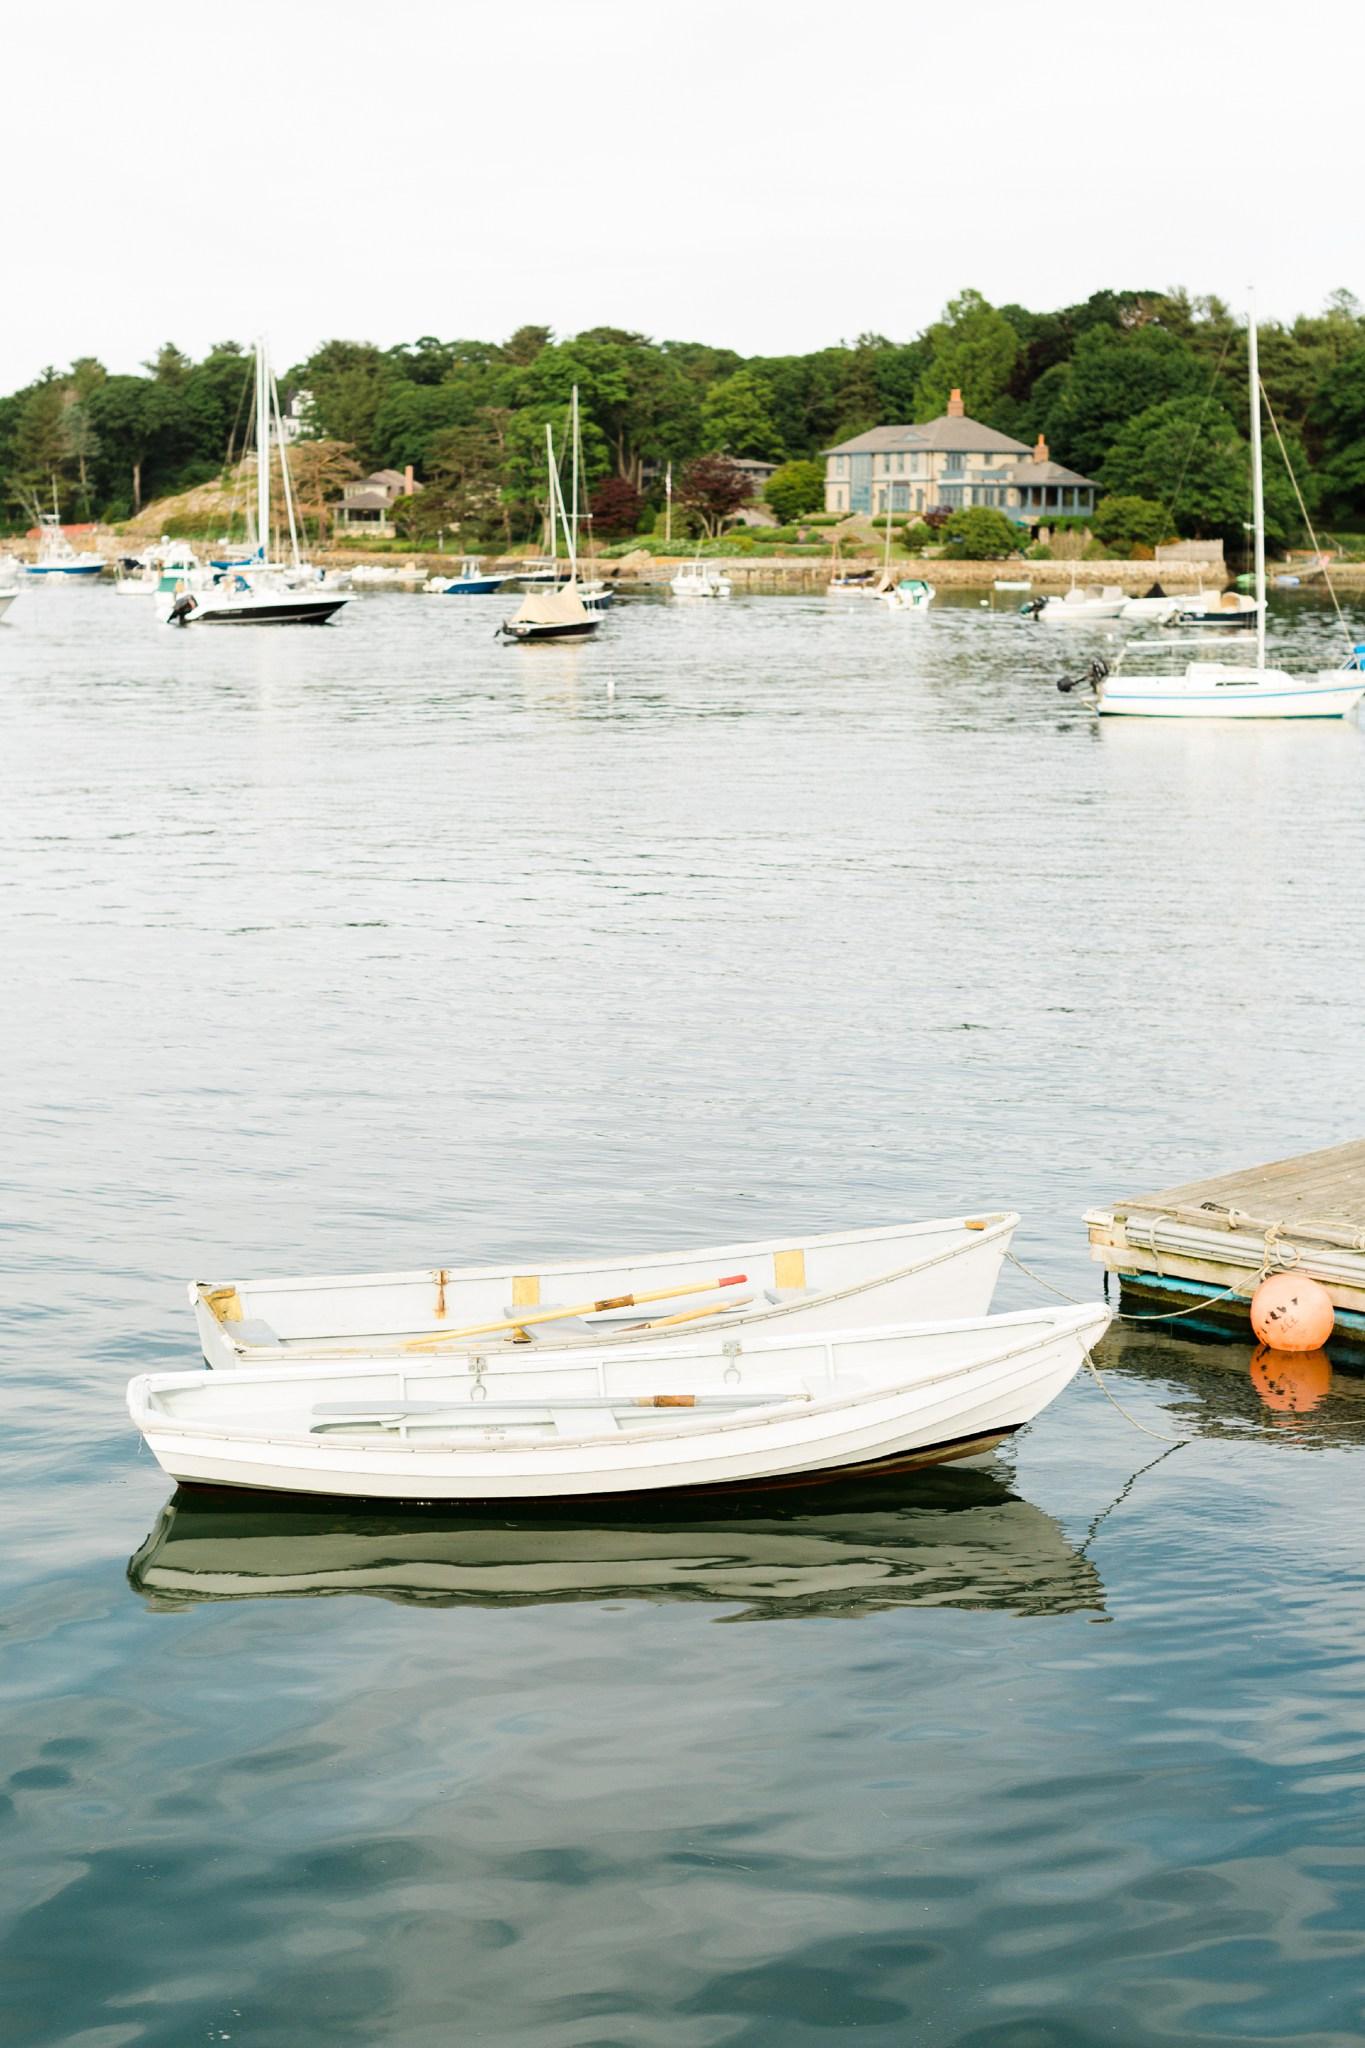 manchester_yacht_club_deborah_zoe_00003.JPG